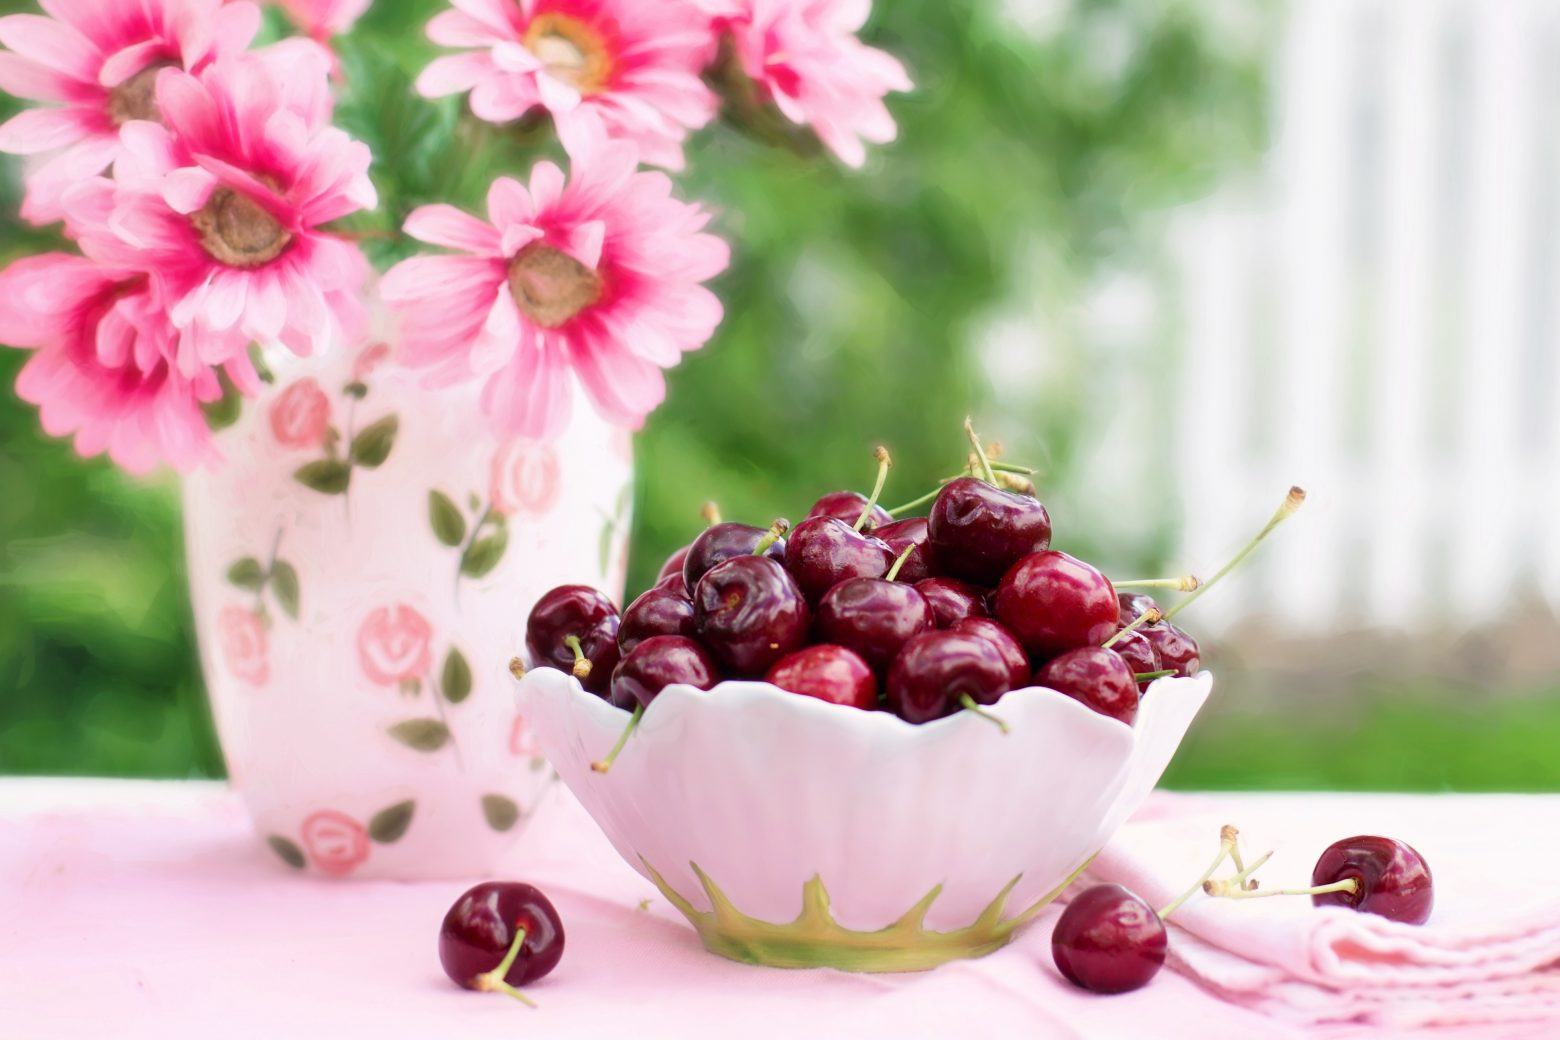 cherries-in-a-bowl-773021